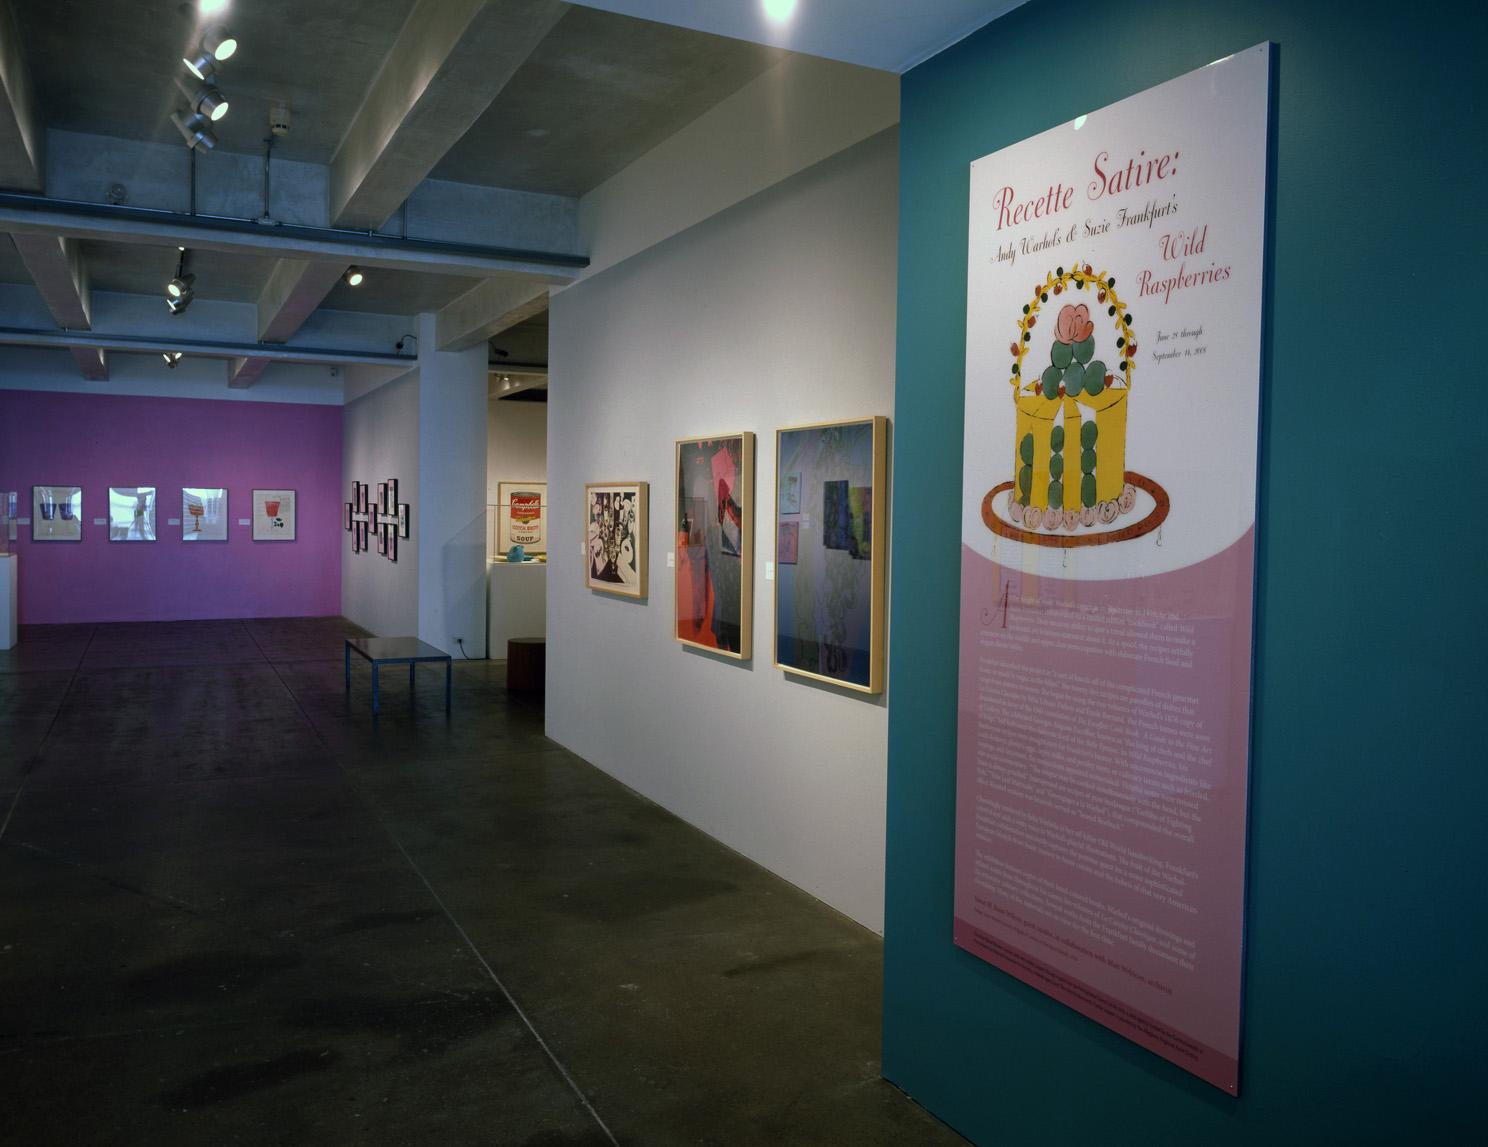 Recette Satire (Wild Raspberries) exhibition at The Andy Warhol Museum, 2008 (1).jpg